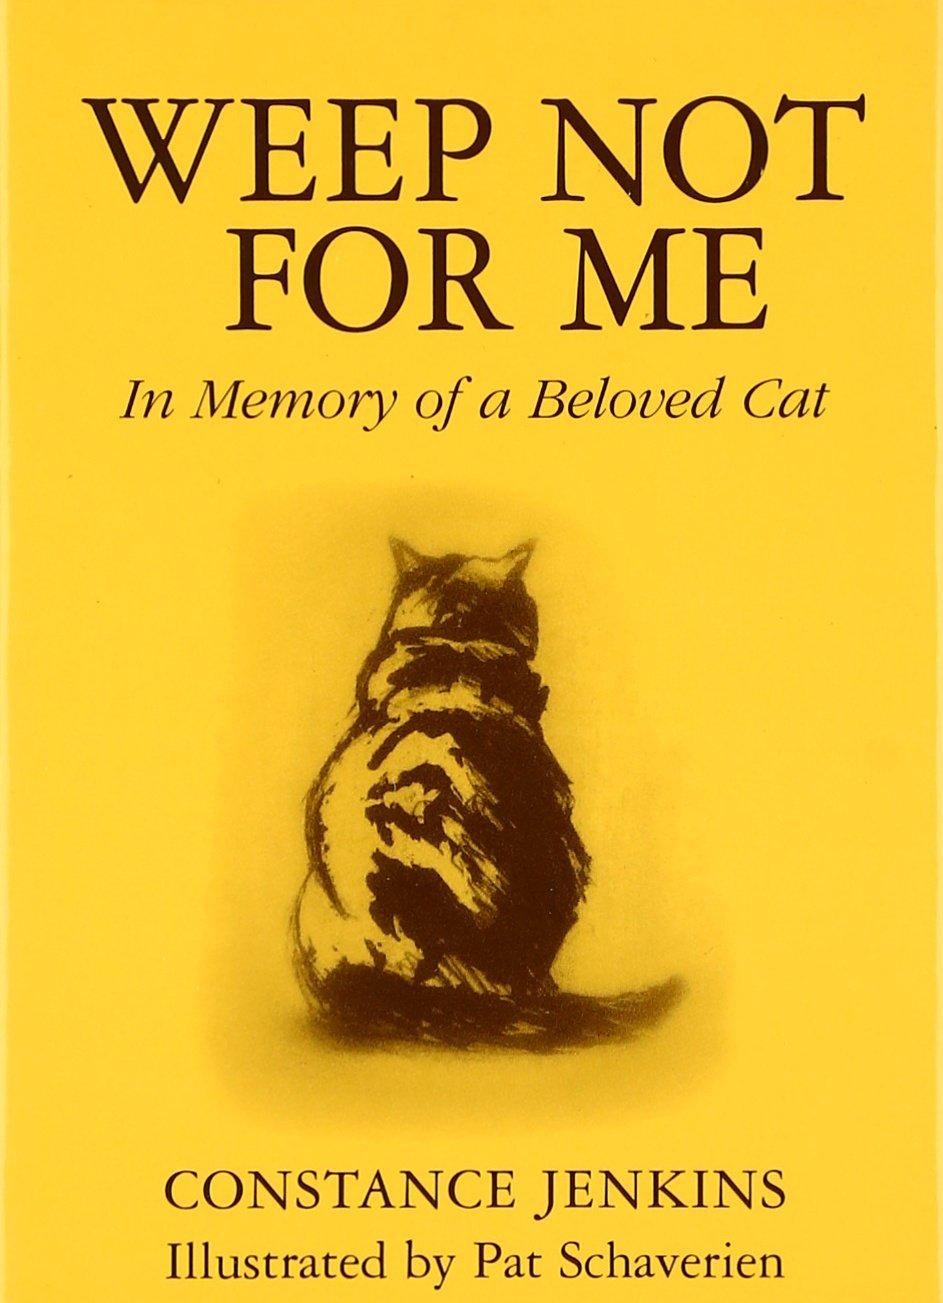 Weep Not Me Memory Beloved product image